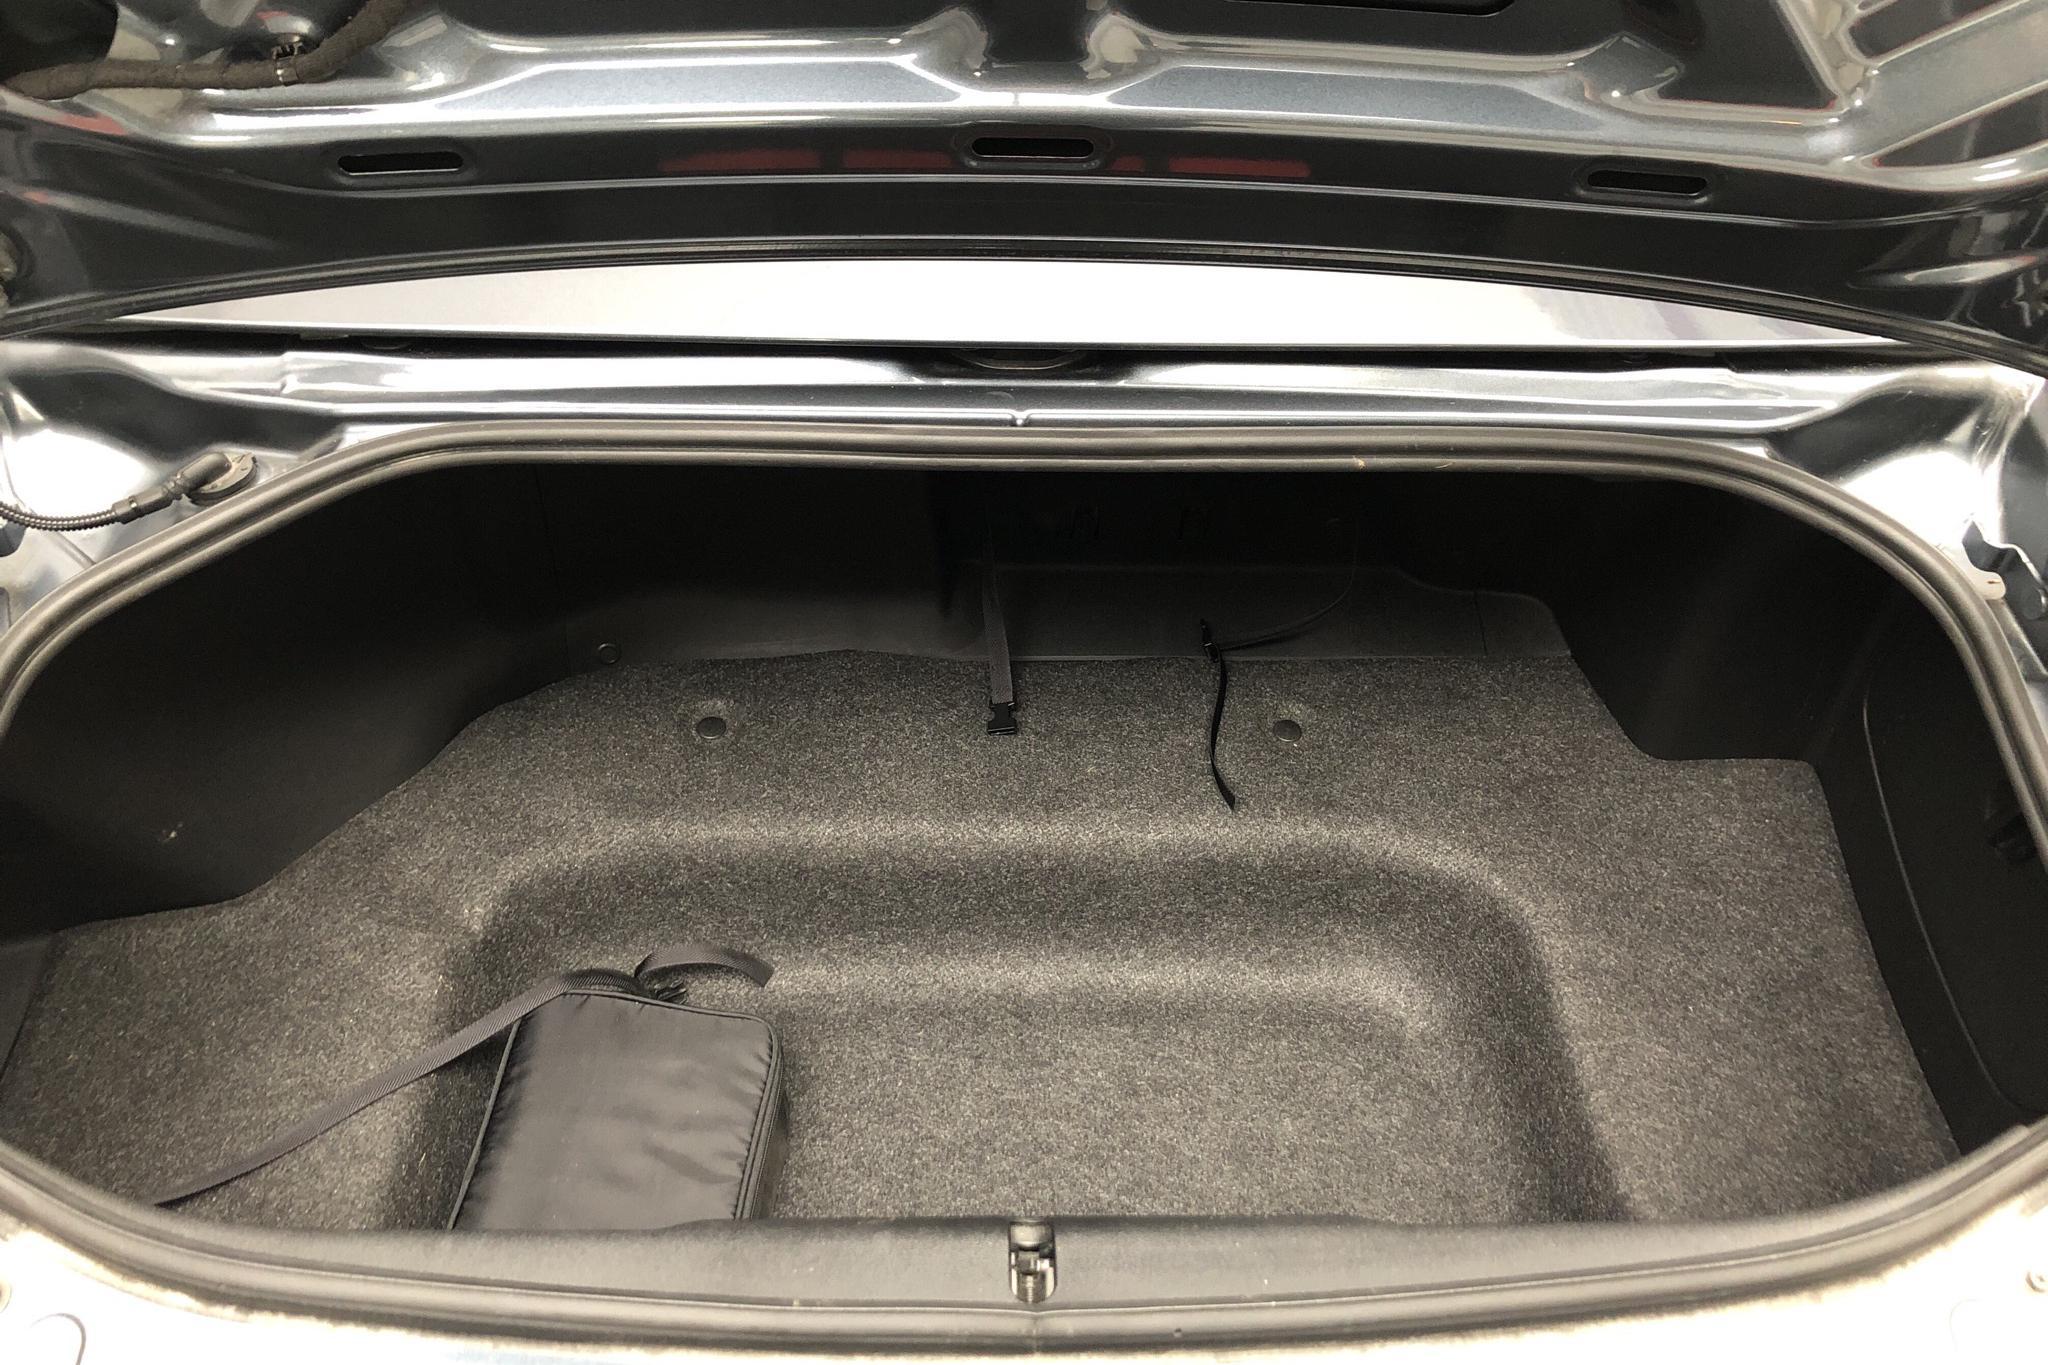 Mazda MX-5 1.8 (126hk) - 1 101 mil - Manuell - grå - 2012